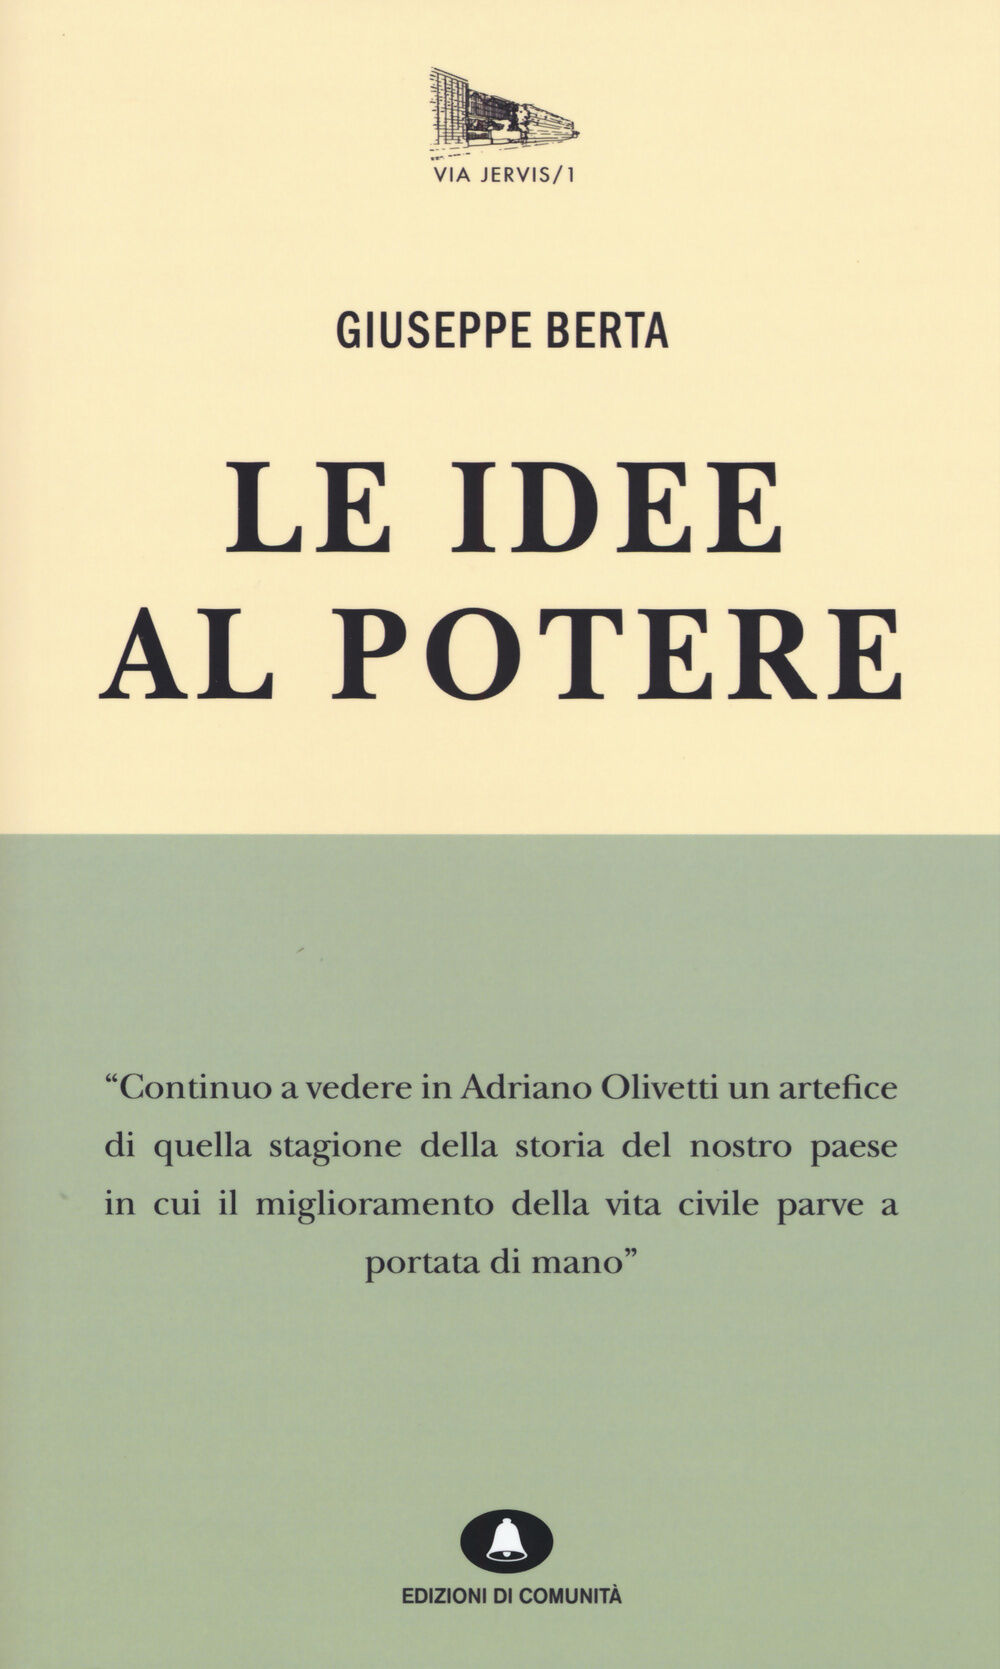 Le idee al potere